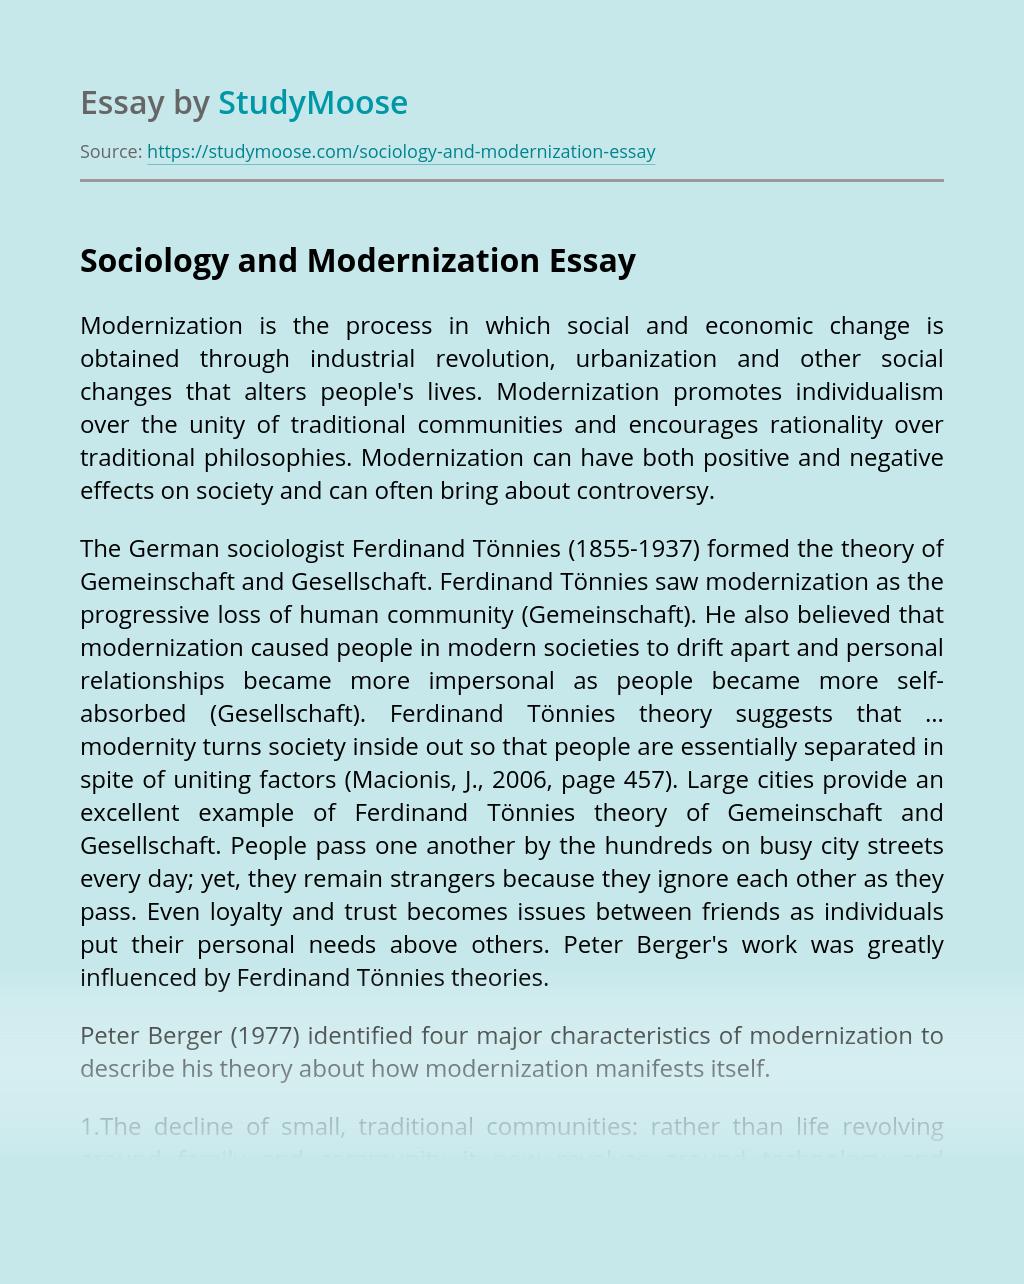 Sociology and Modernization